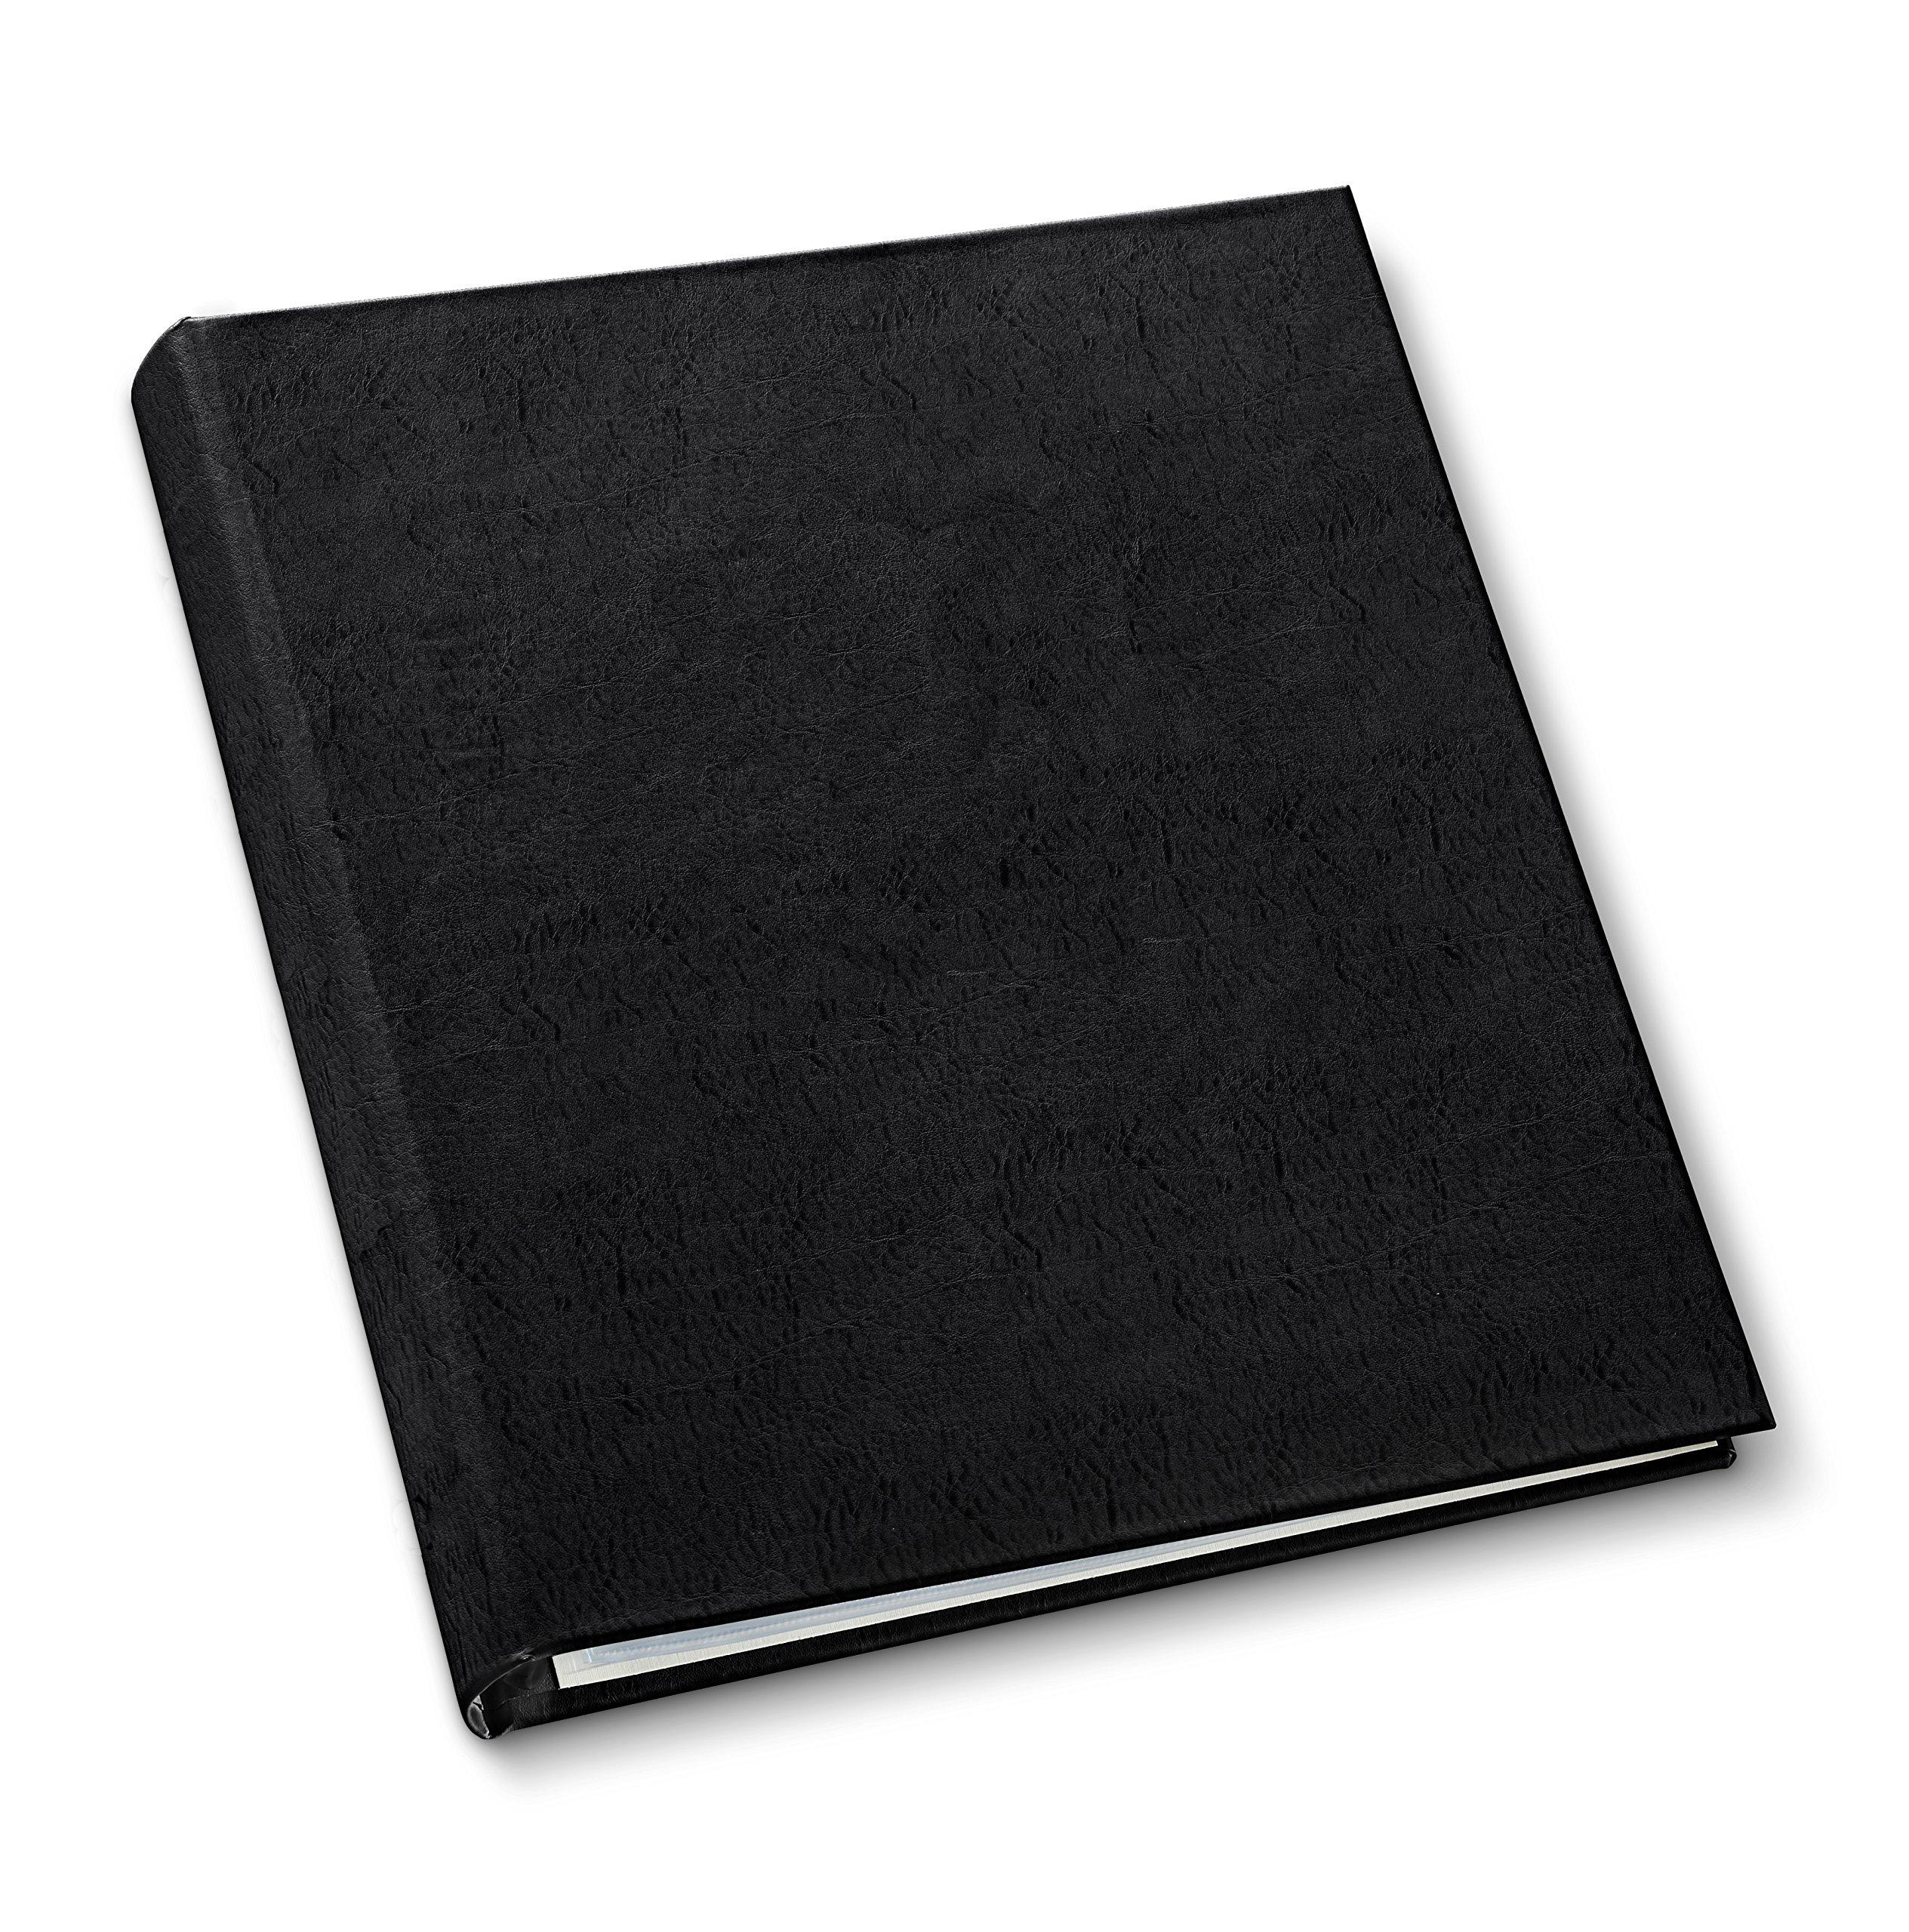 Gallery Leather Presentation Binder 1 1/4'' Freeport Black